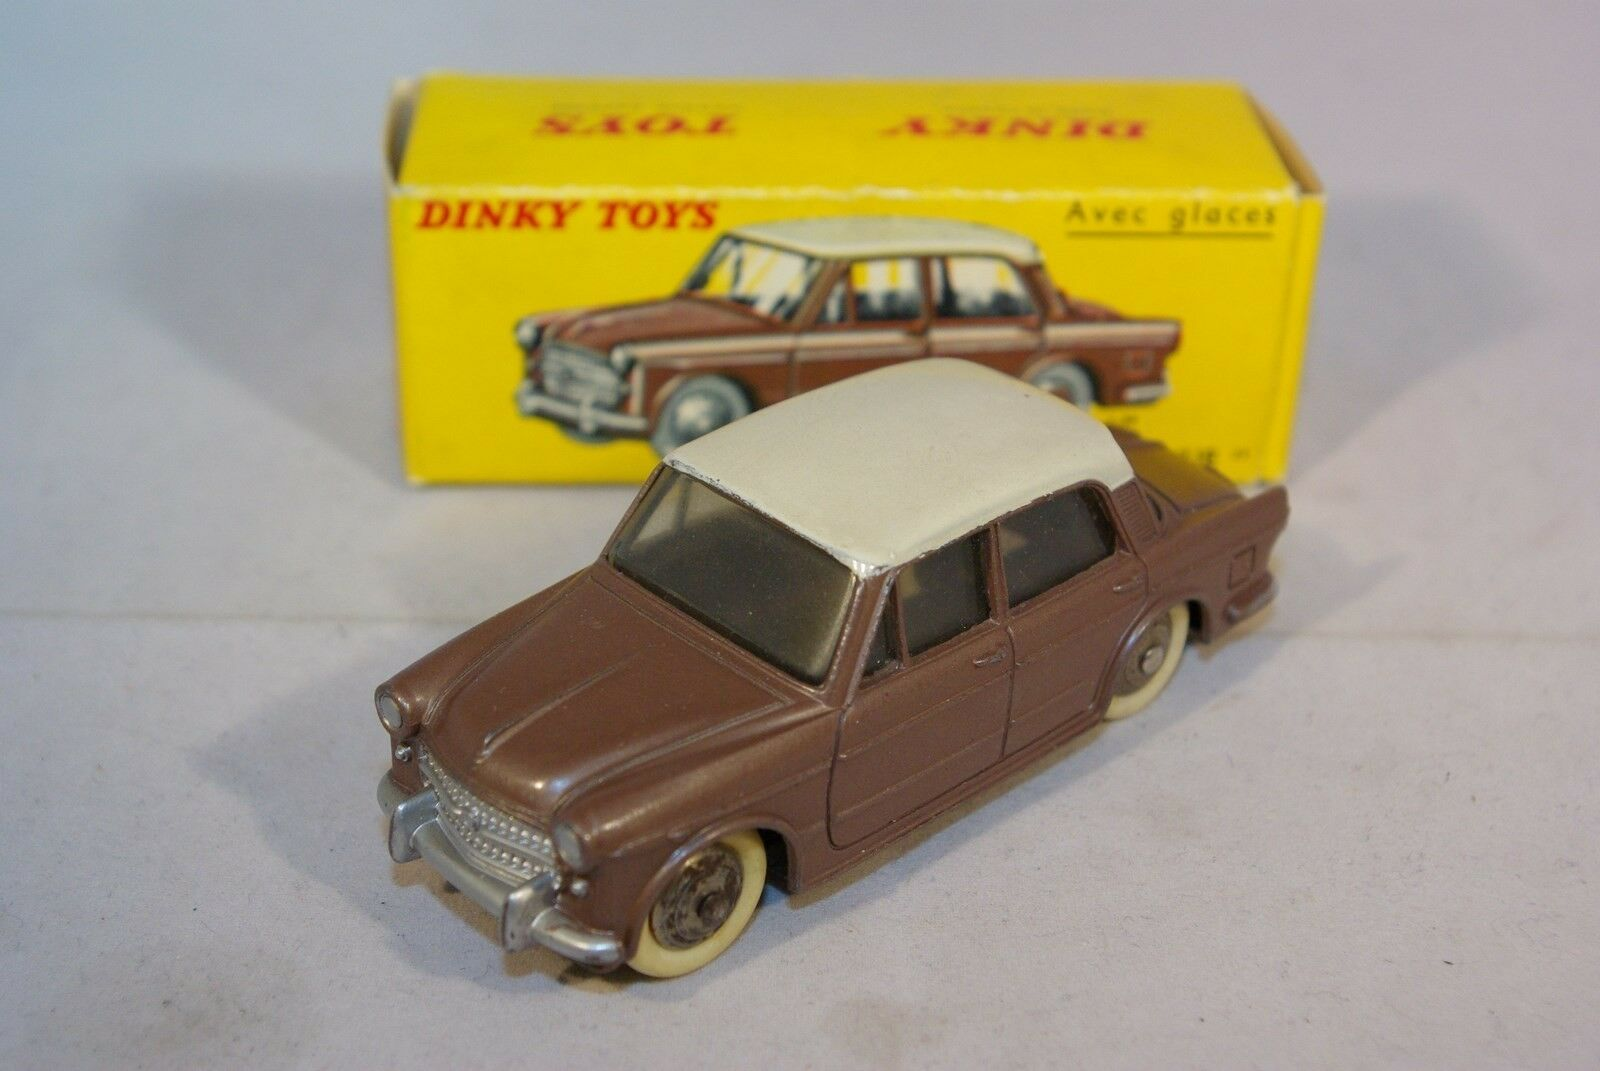 DINKY TOYS 531 FIAT 1200 GRANDE VUE VN MINT BOXED RARE SELTEN RARO